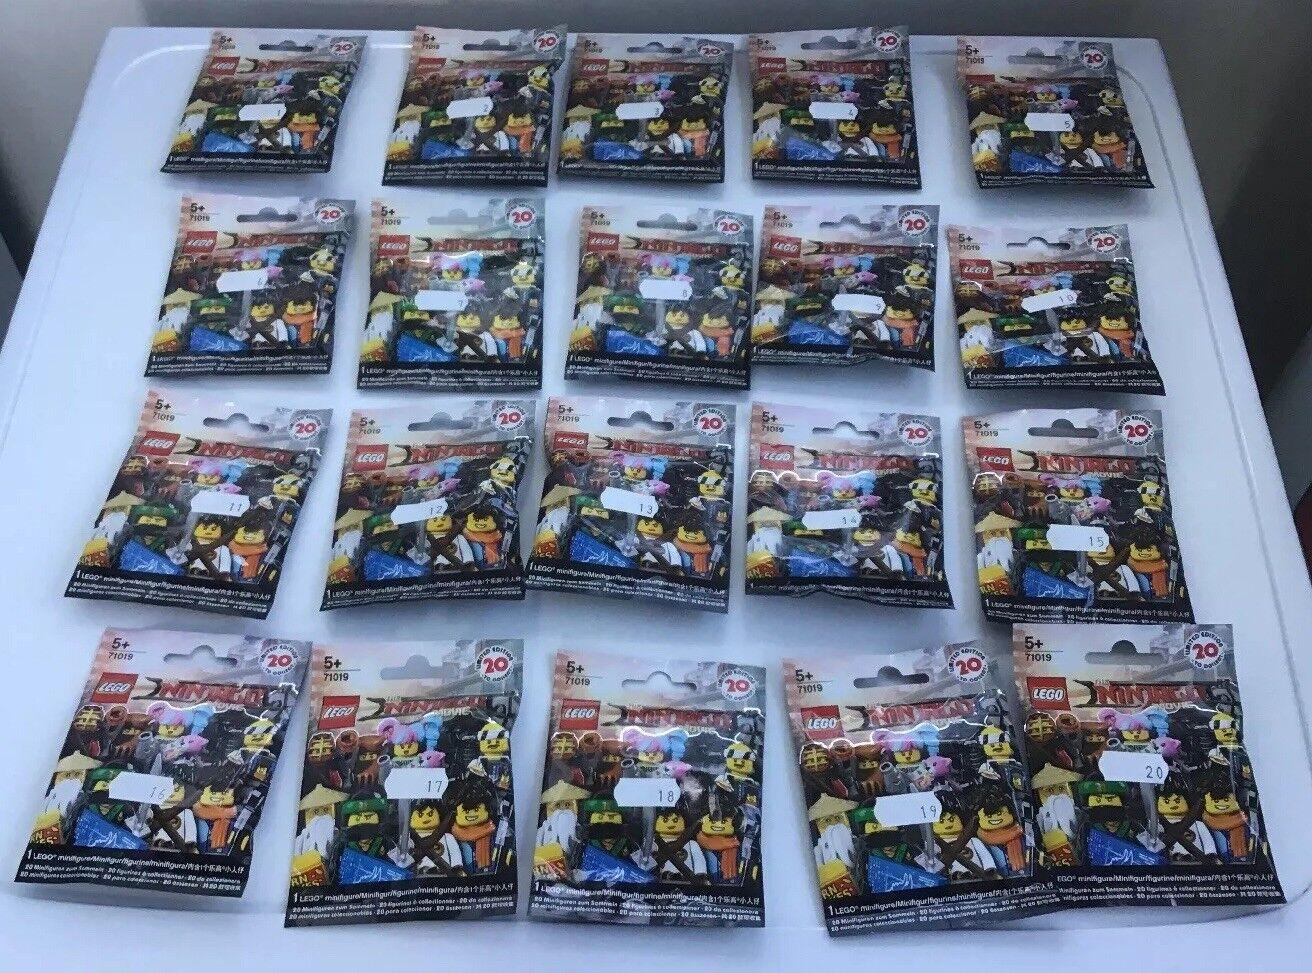 Lego Minifigures Ninjago Película Set 71019 completa 20 Minifiguras de 2017  Nuevo